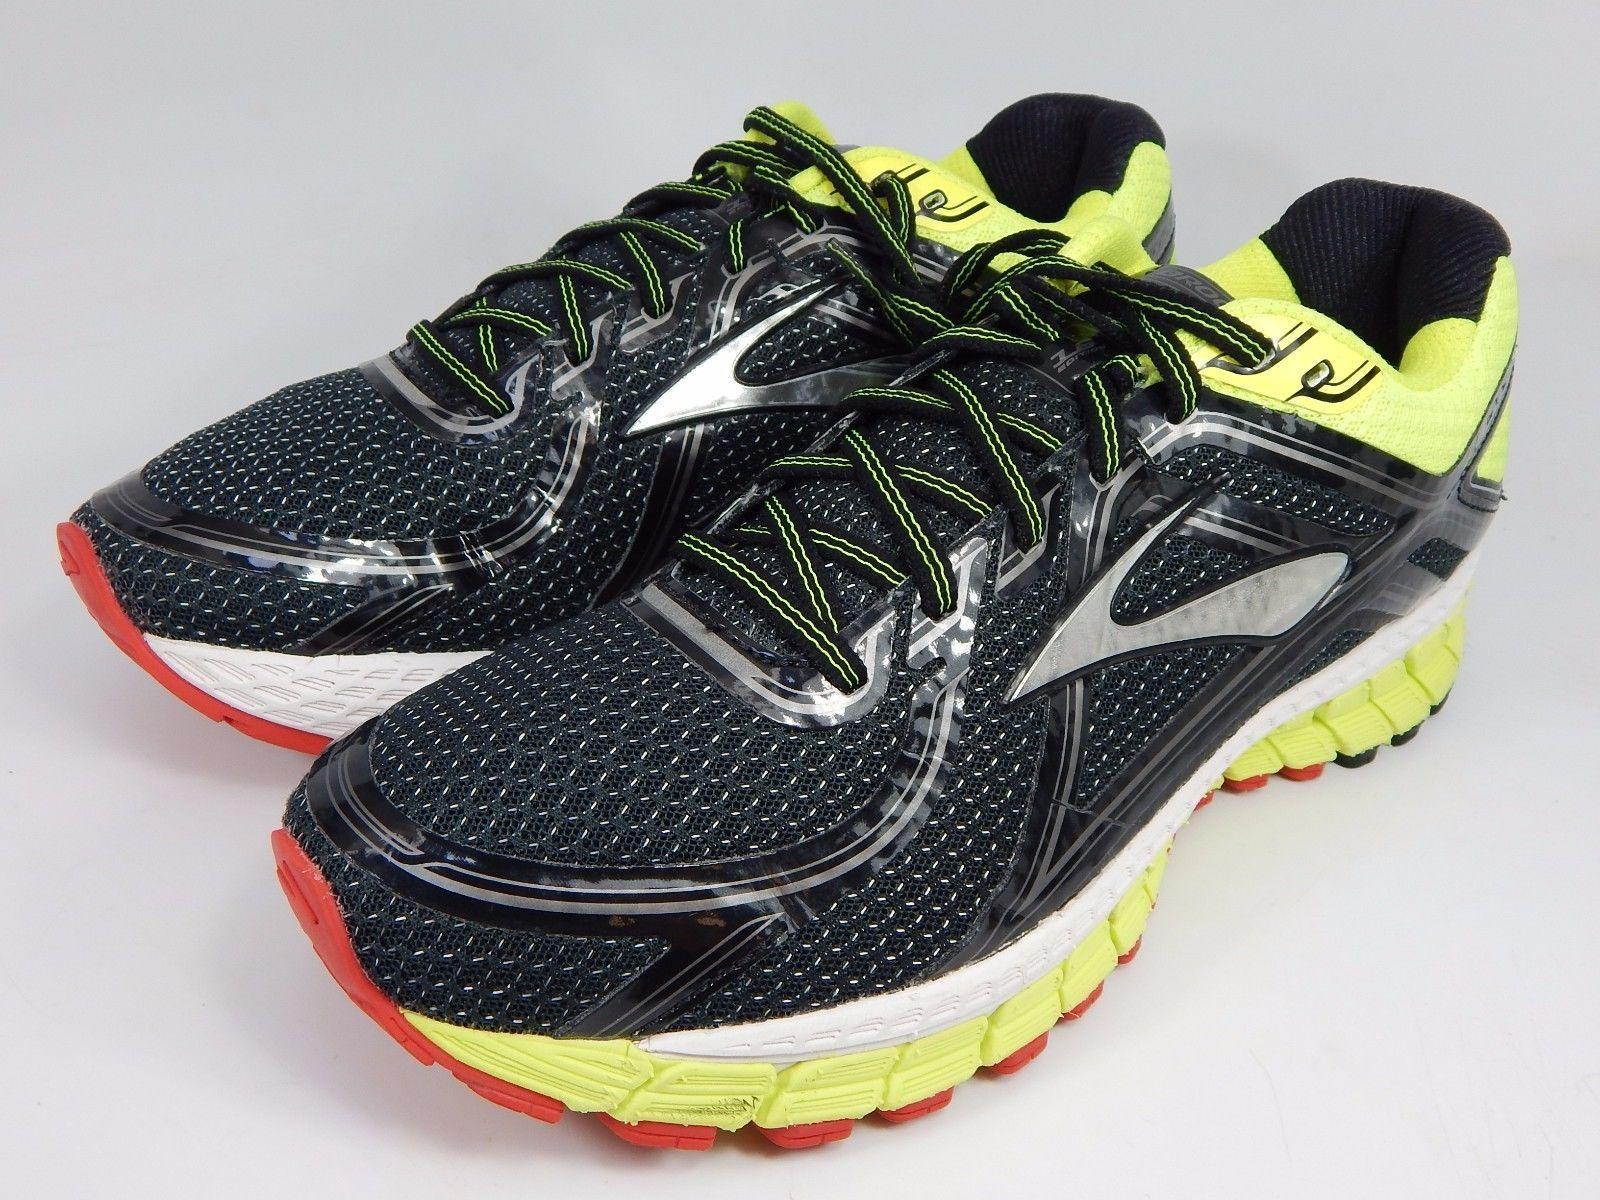 Brooks GTS 16 Men's Running Shoes Size US 9 M (D) EU 42.5 Black 1102121D081